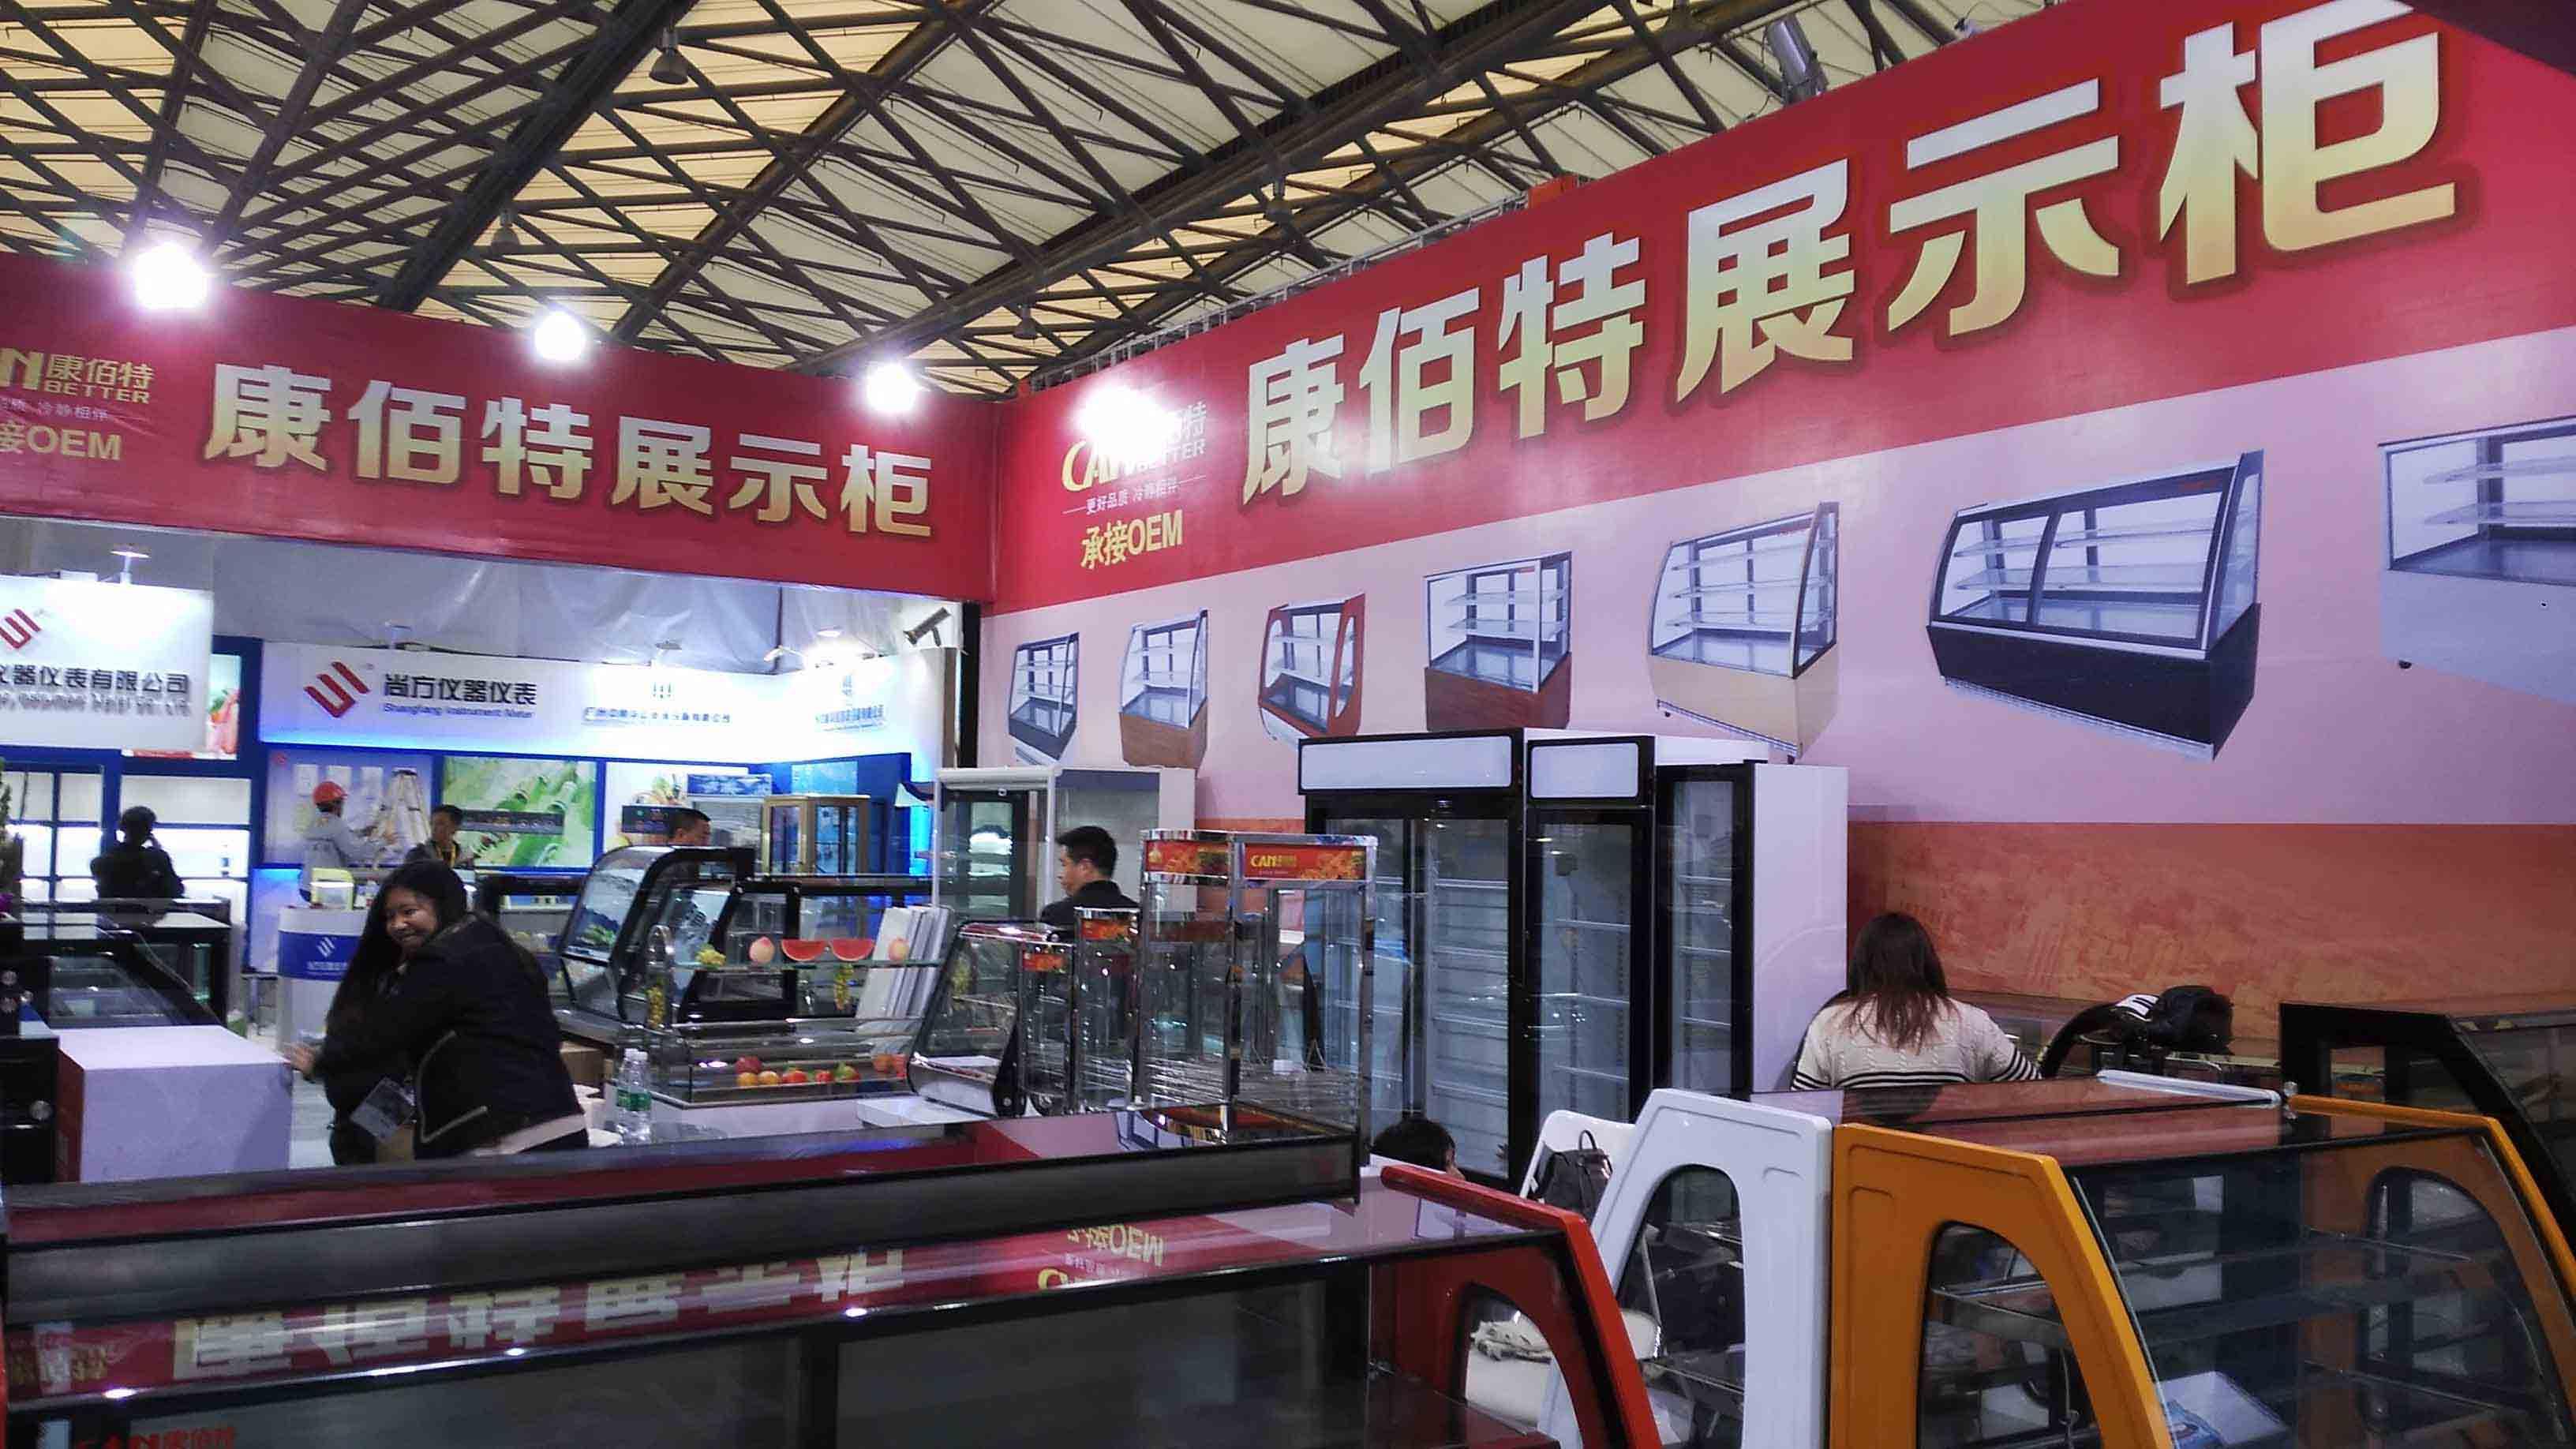 Shanghai Hotlex Exhibition